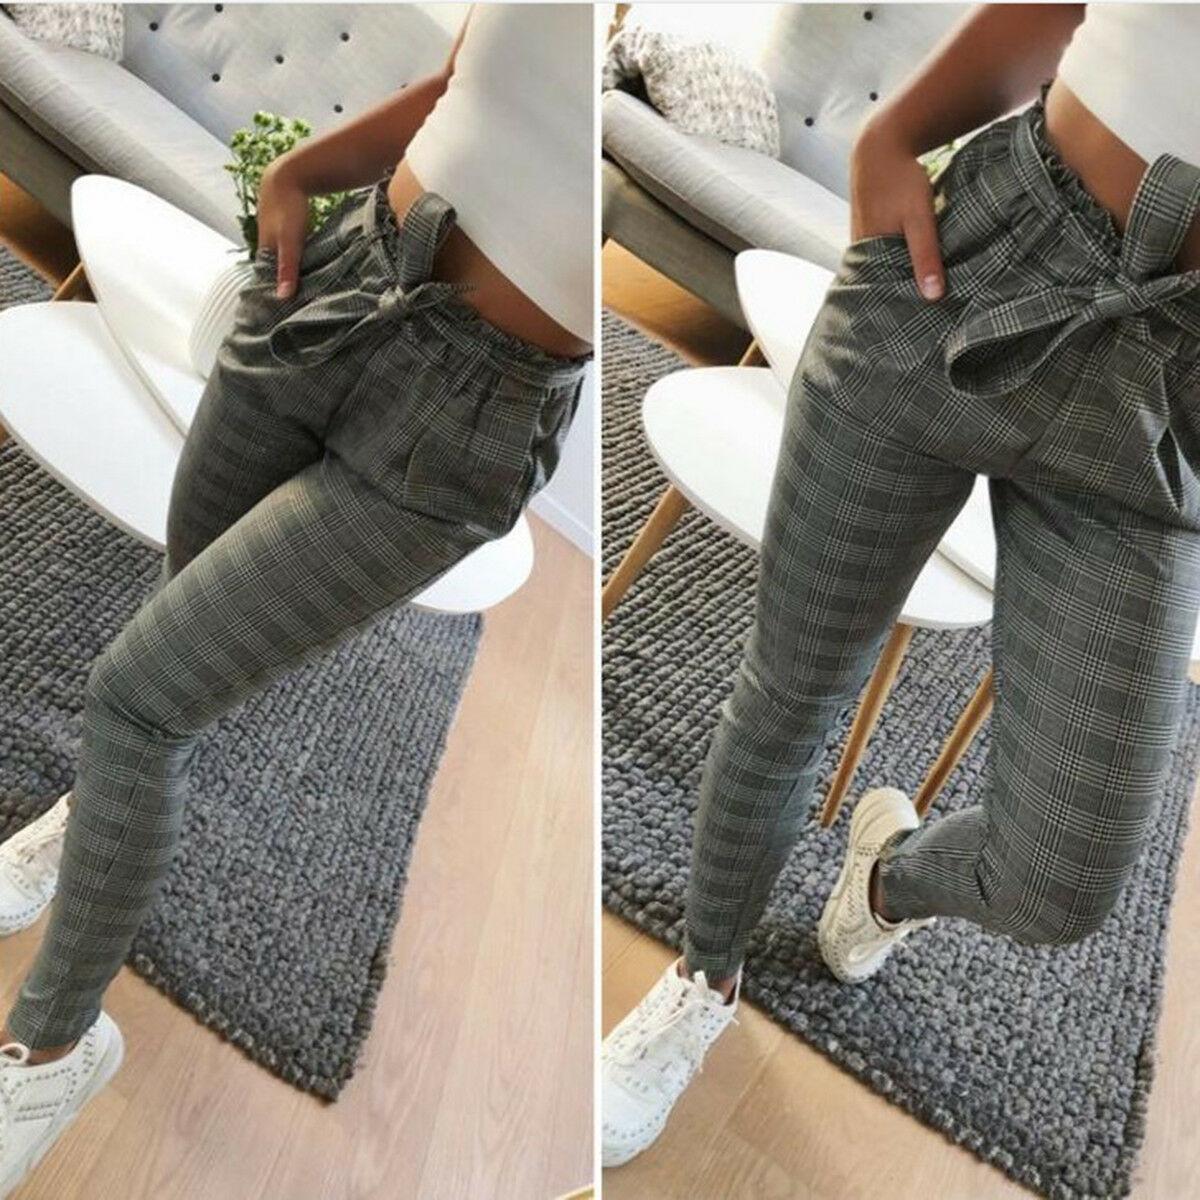 Women Pants,Womens Casual Loose High Waist Long Pencil Pants with Bow Tie Belt Striped Casual Pants Chaofanjiancai